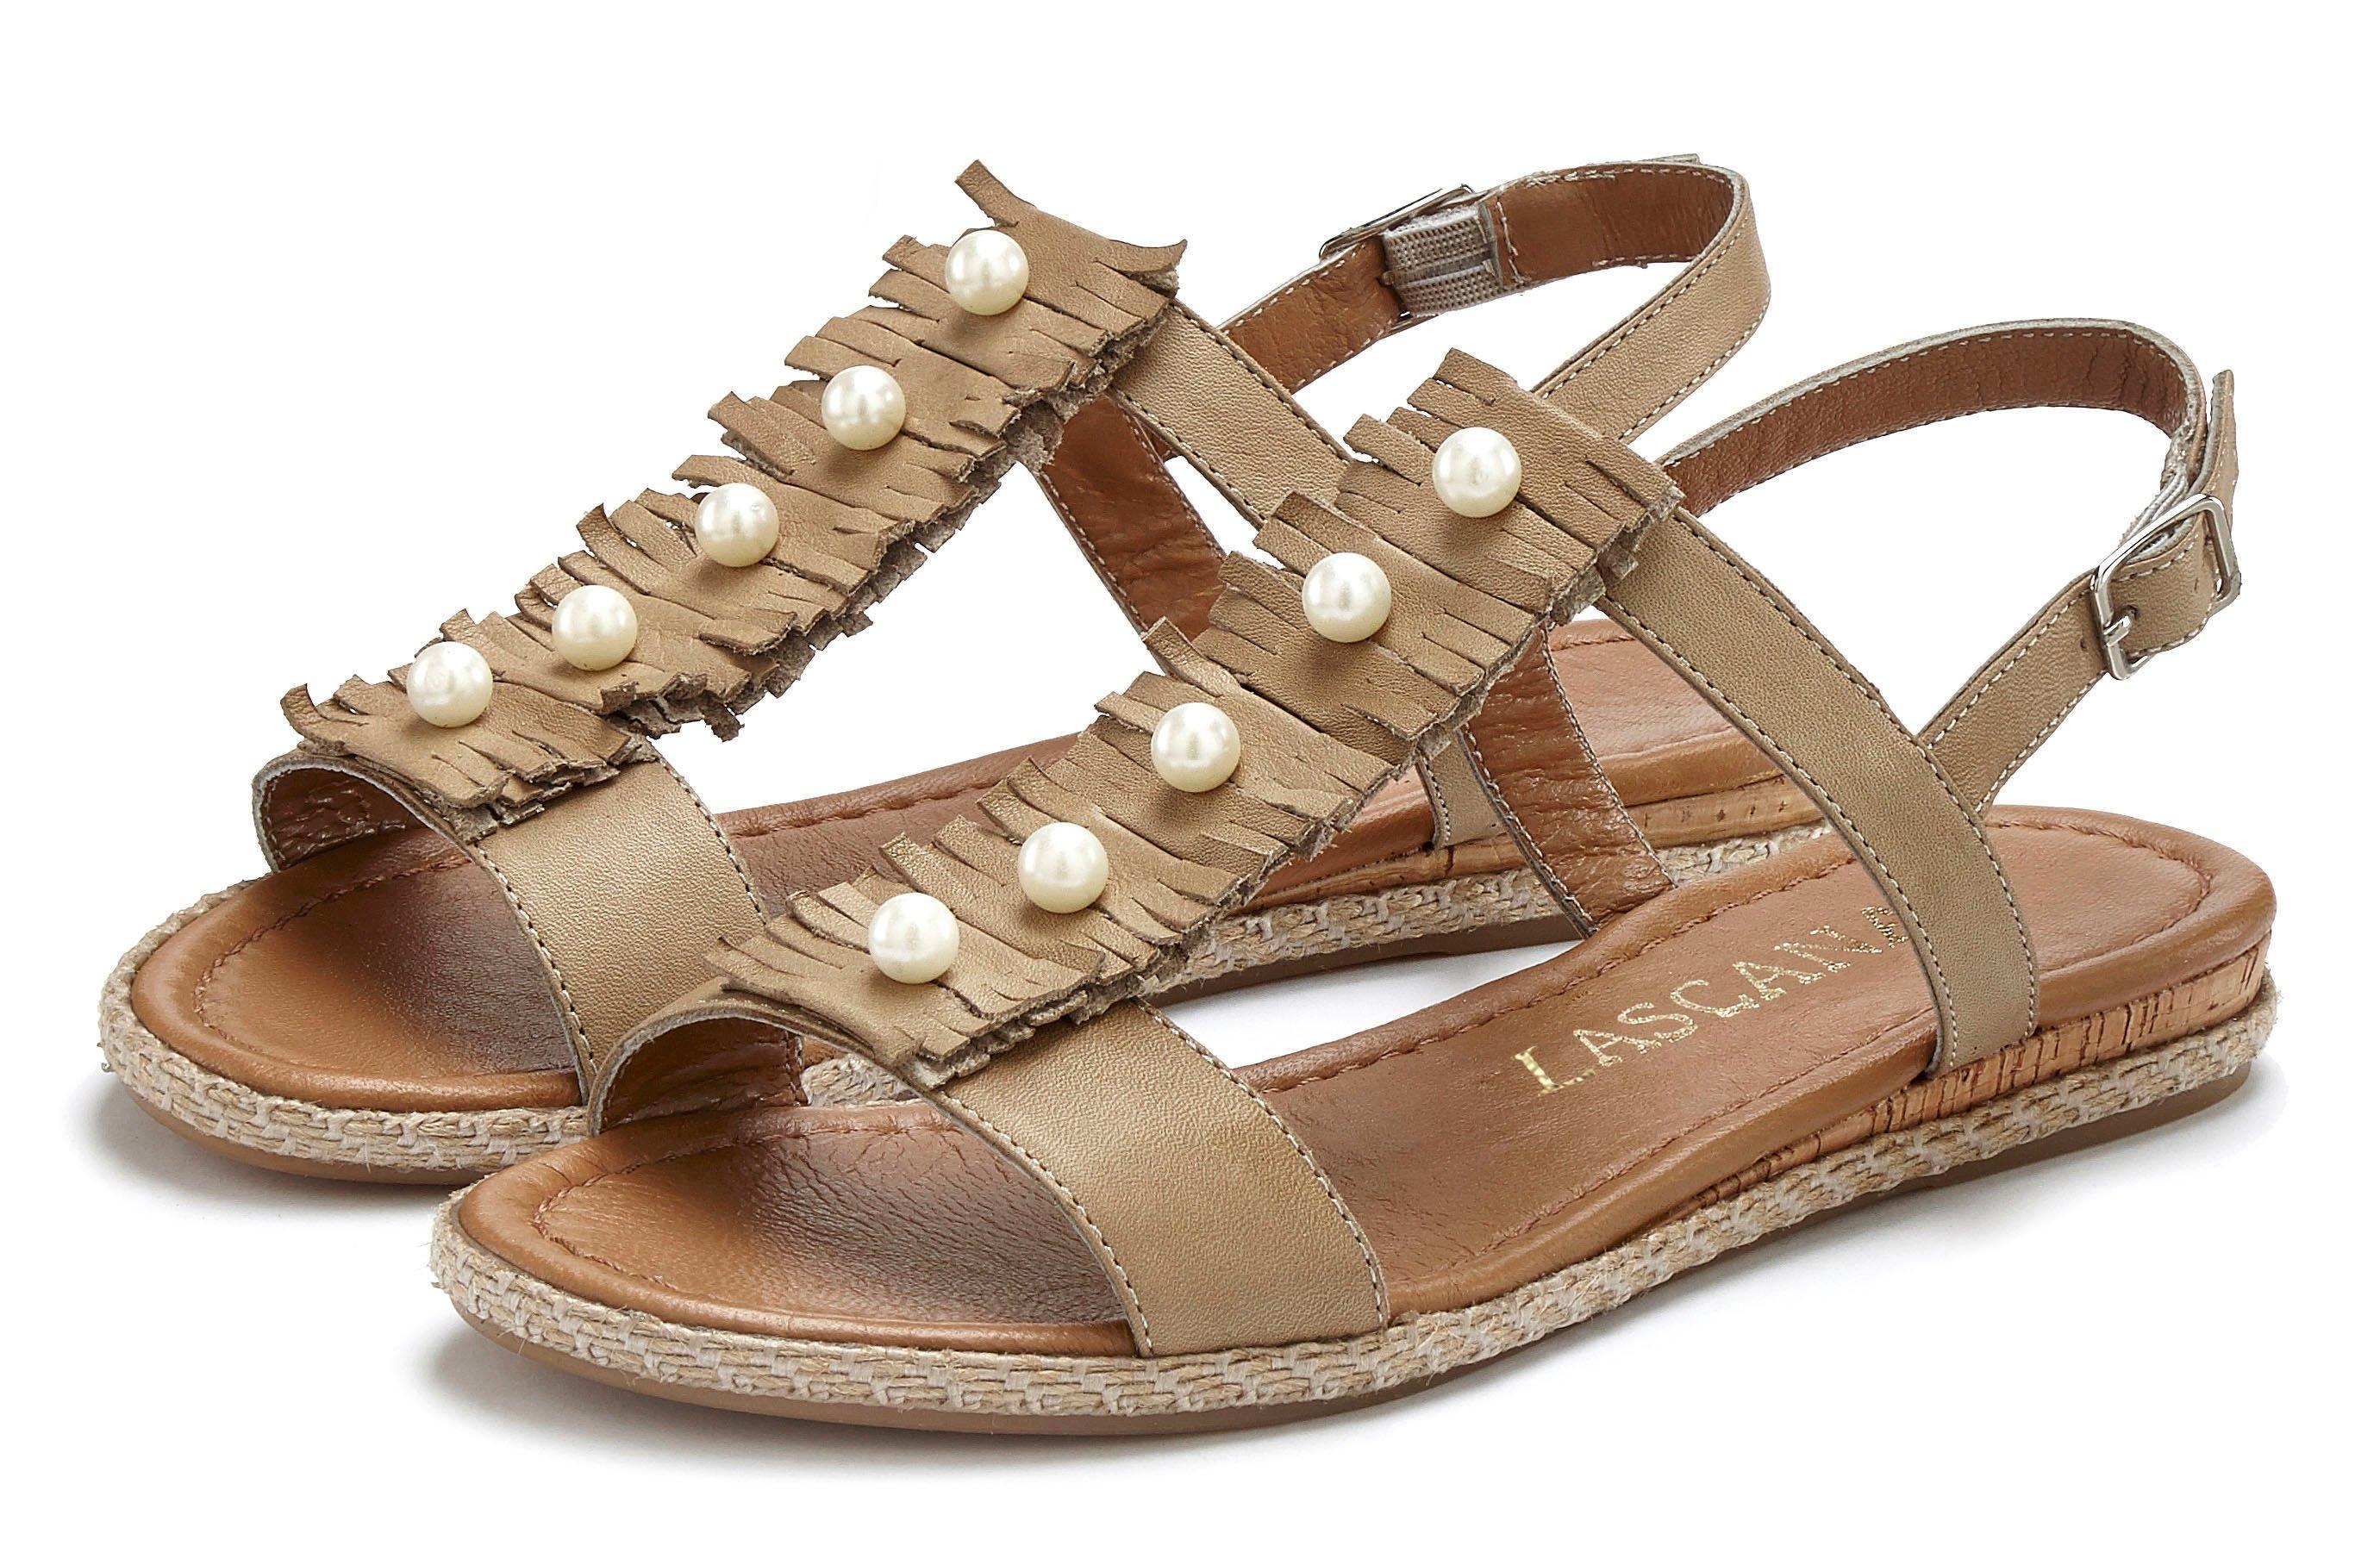 LASCANA sandalen nu online kopen bij Lascana